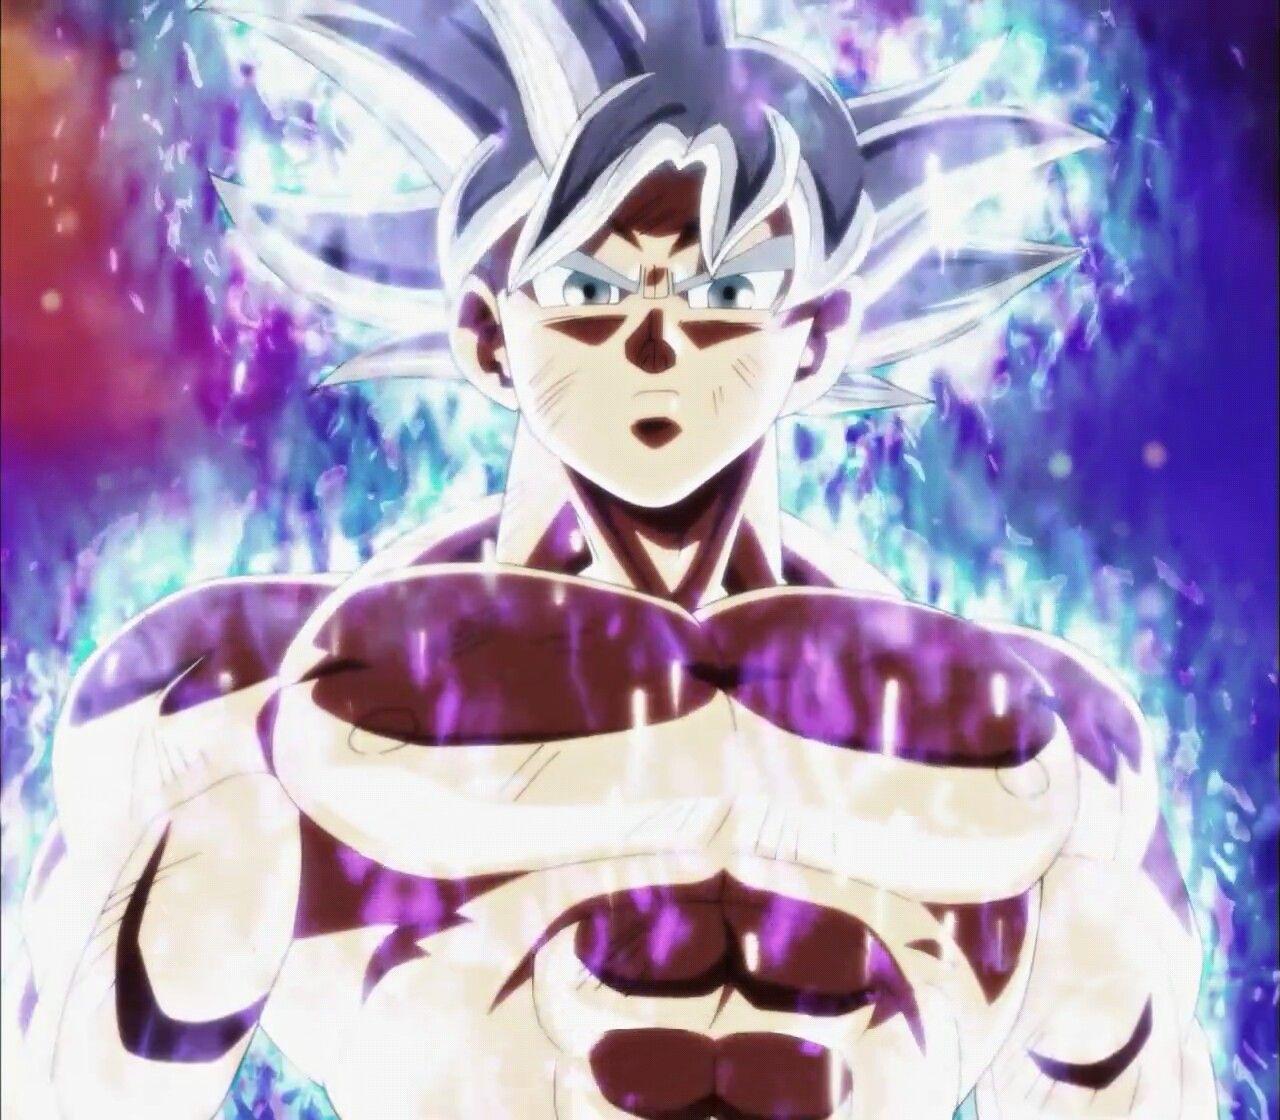 Mastered Ultra Instinct Goku Shirtless W Edited By Me Dragon Ball Super Goku Dragon Ball Goku Vs Jiren